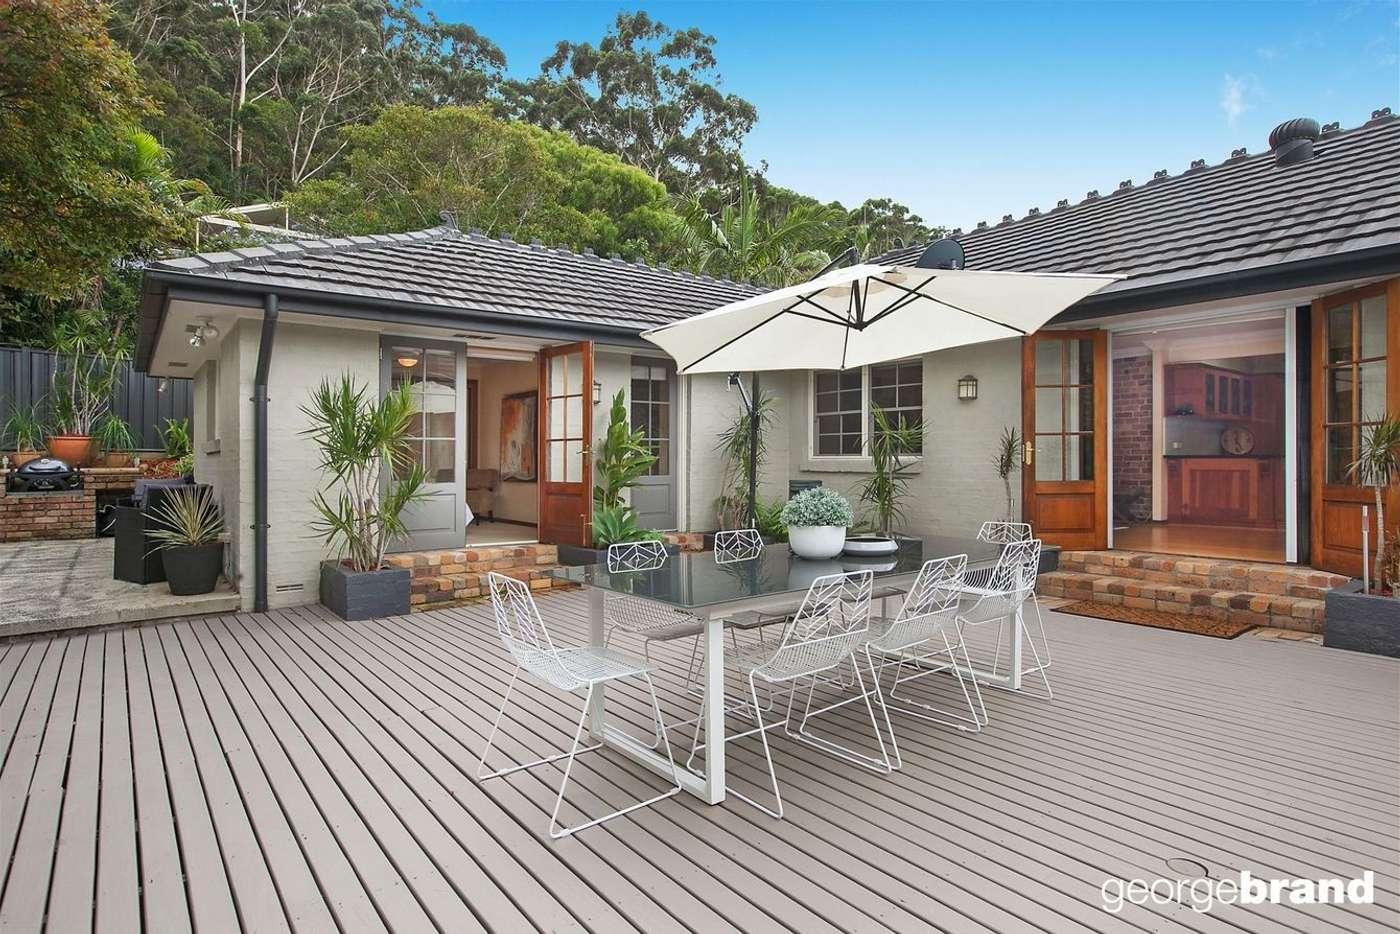 Main view of Homely house listing, 40 Kookaburra Street, Kincumber NSW 2251